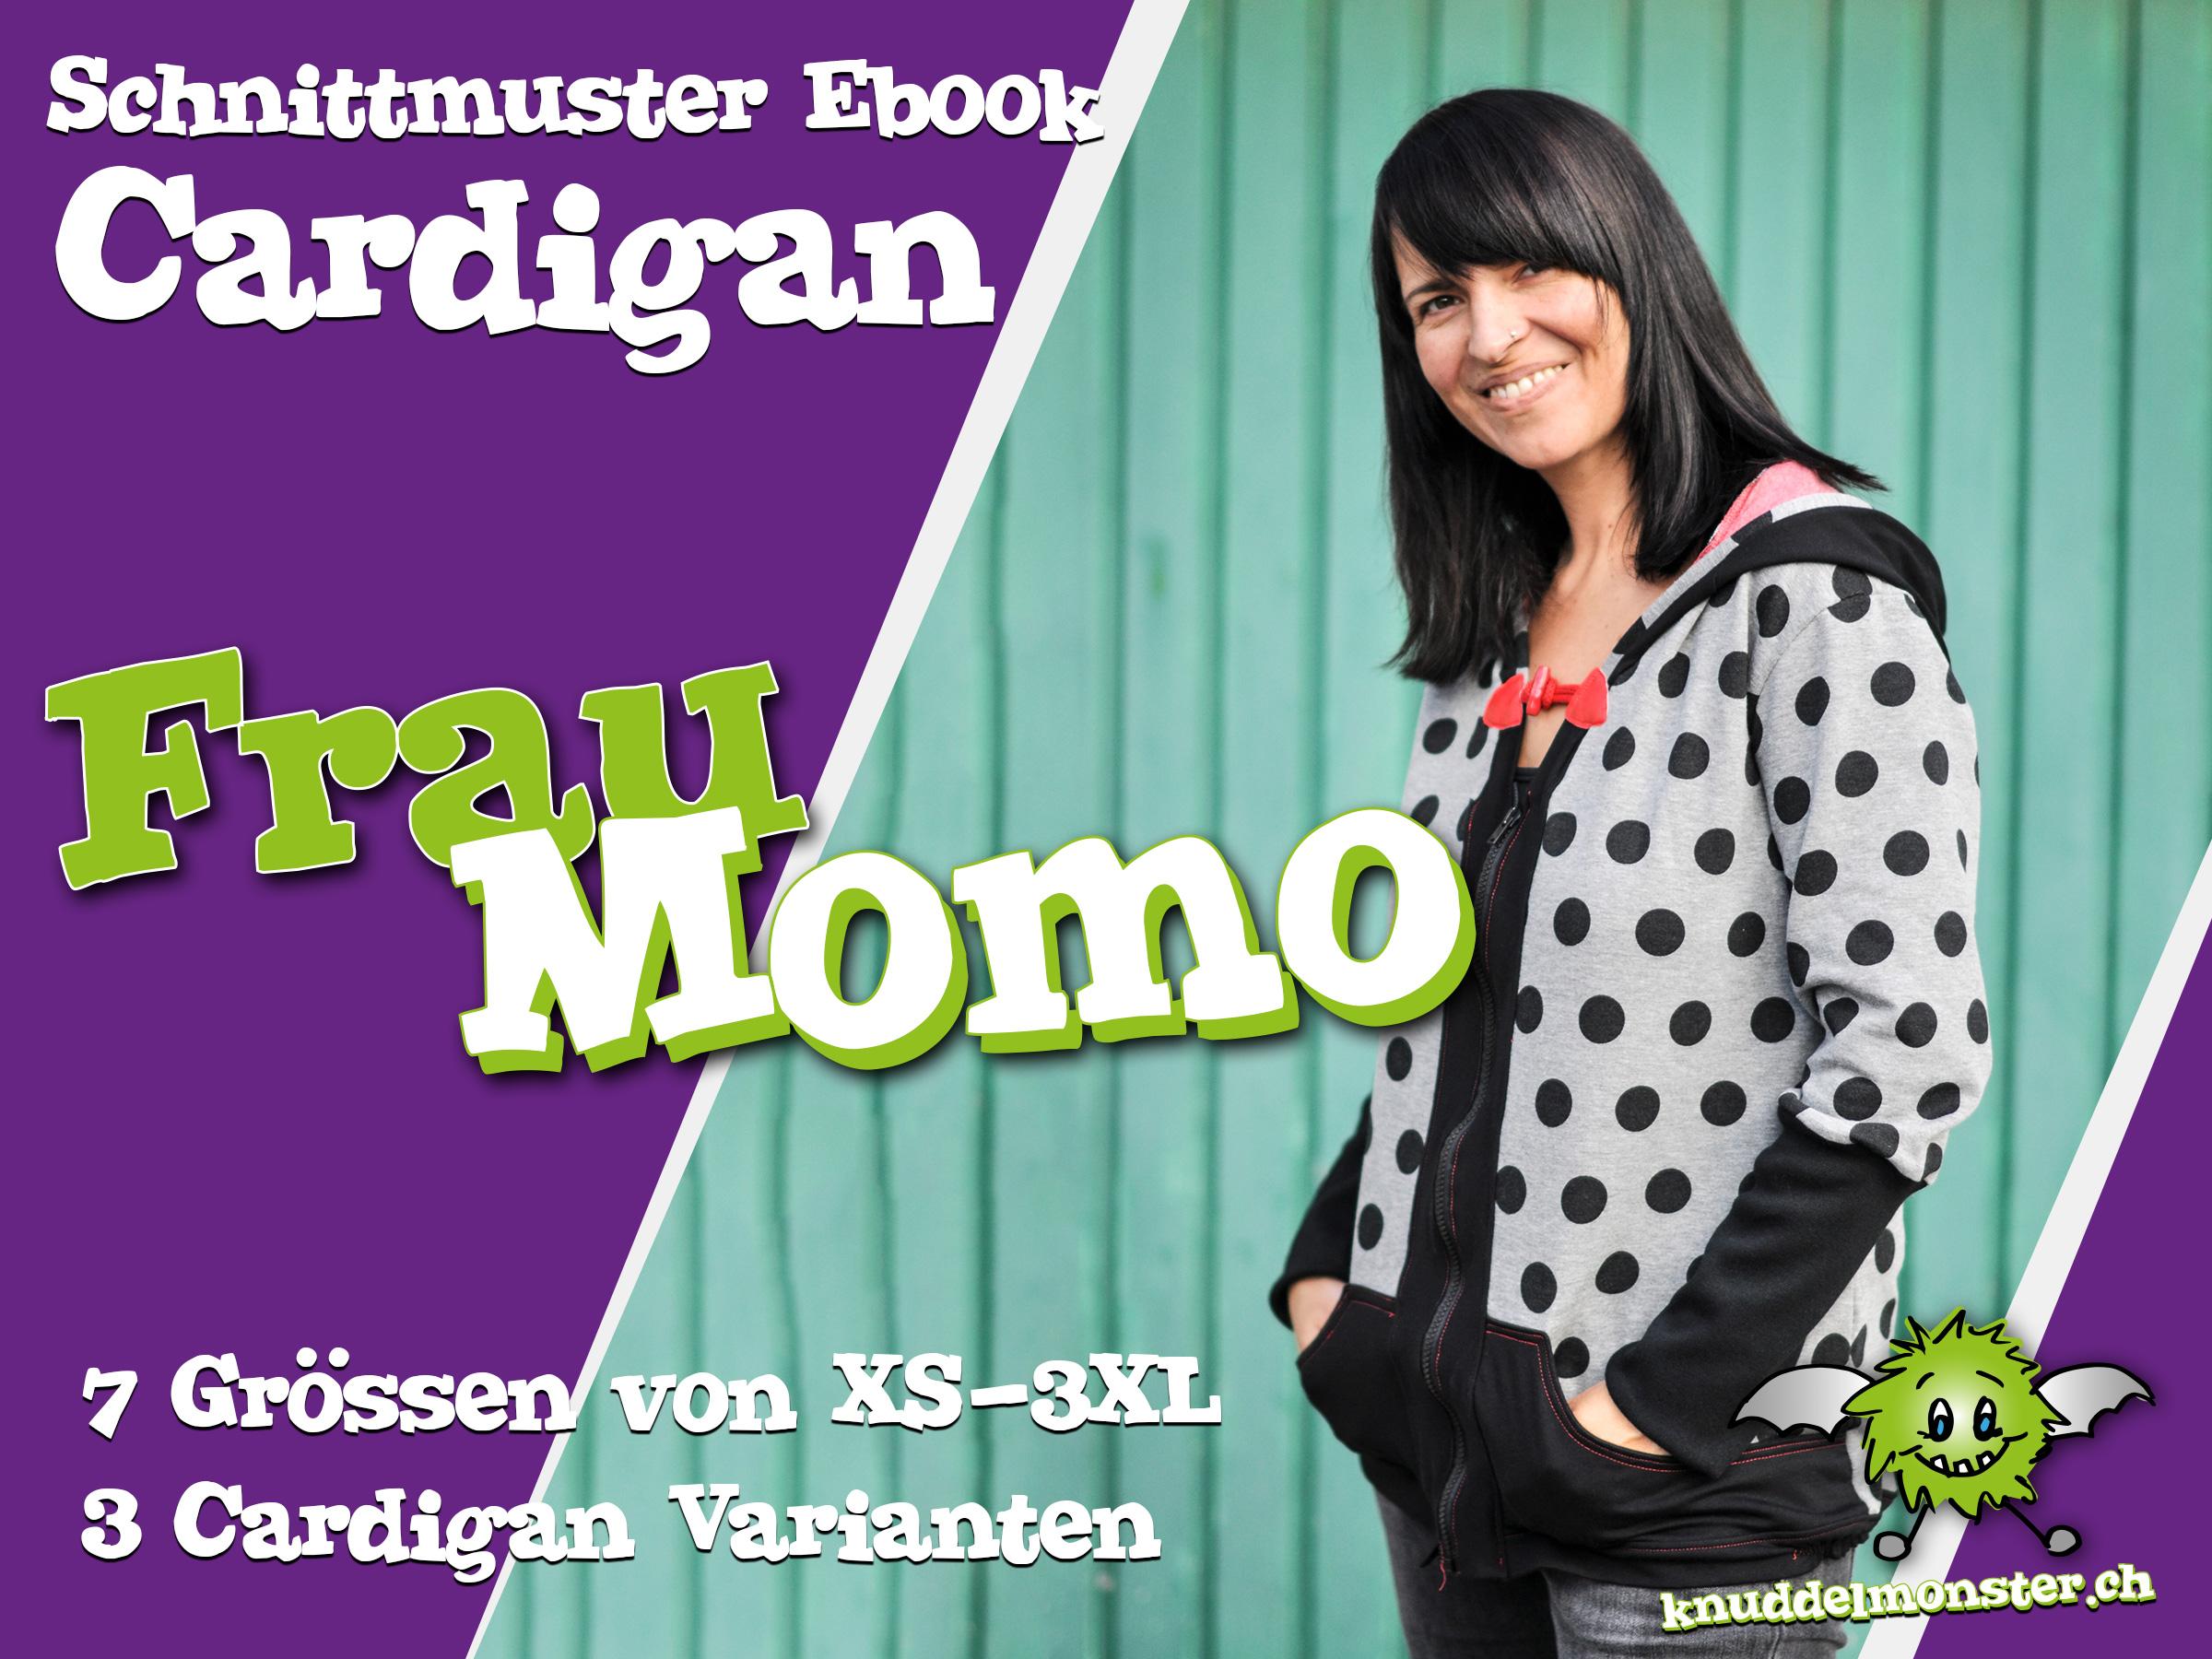 Schnittmuster – Cardigan Frau Momo – Grössen: XS – 3XL | Knuddelmonster